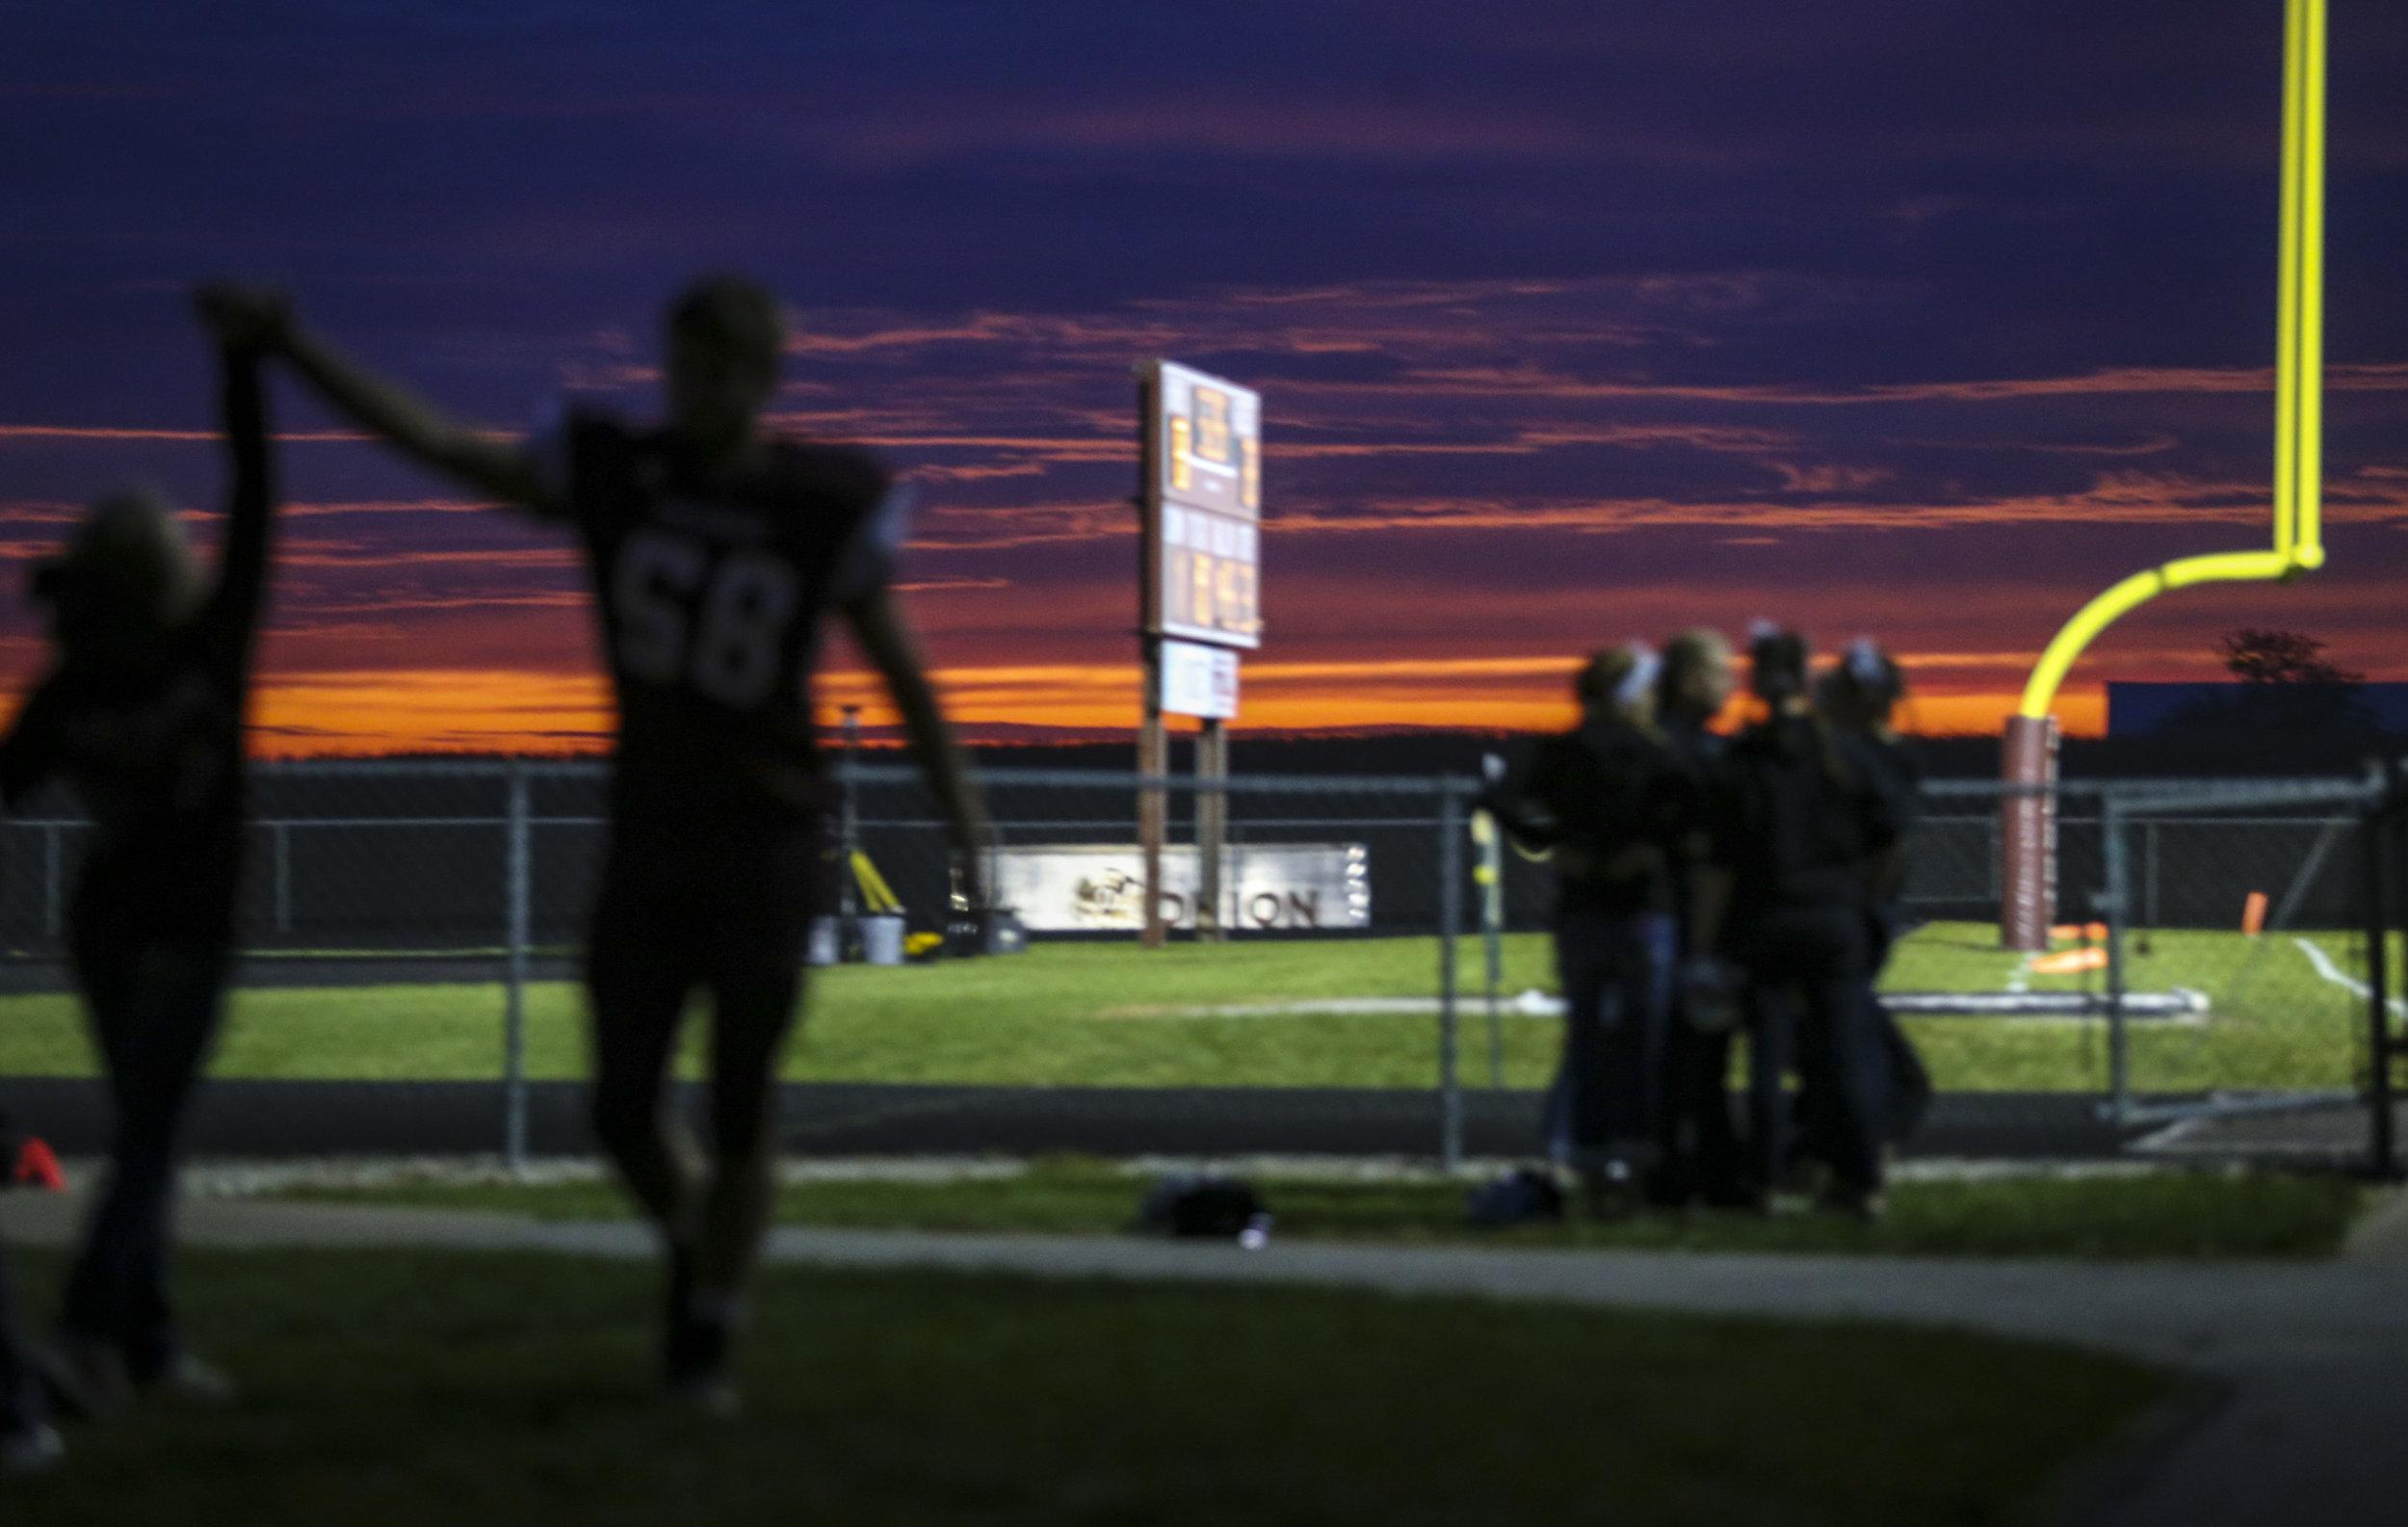 Rockridge's Logan Dierikx (58) gives a high-five while walking toward the locker room before their game at Rockridge High School in Edginton, Friday, October 20, 2017.